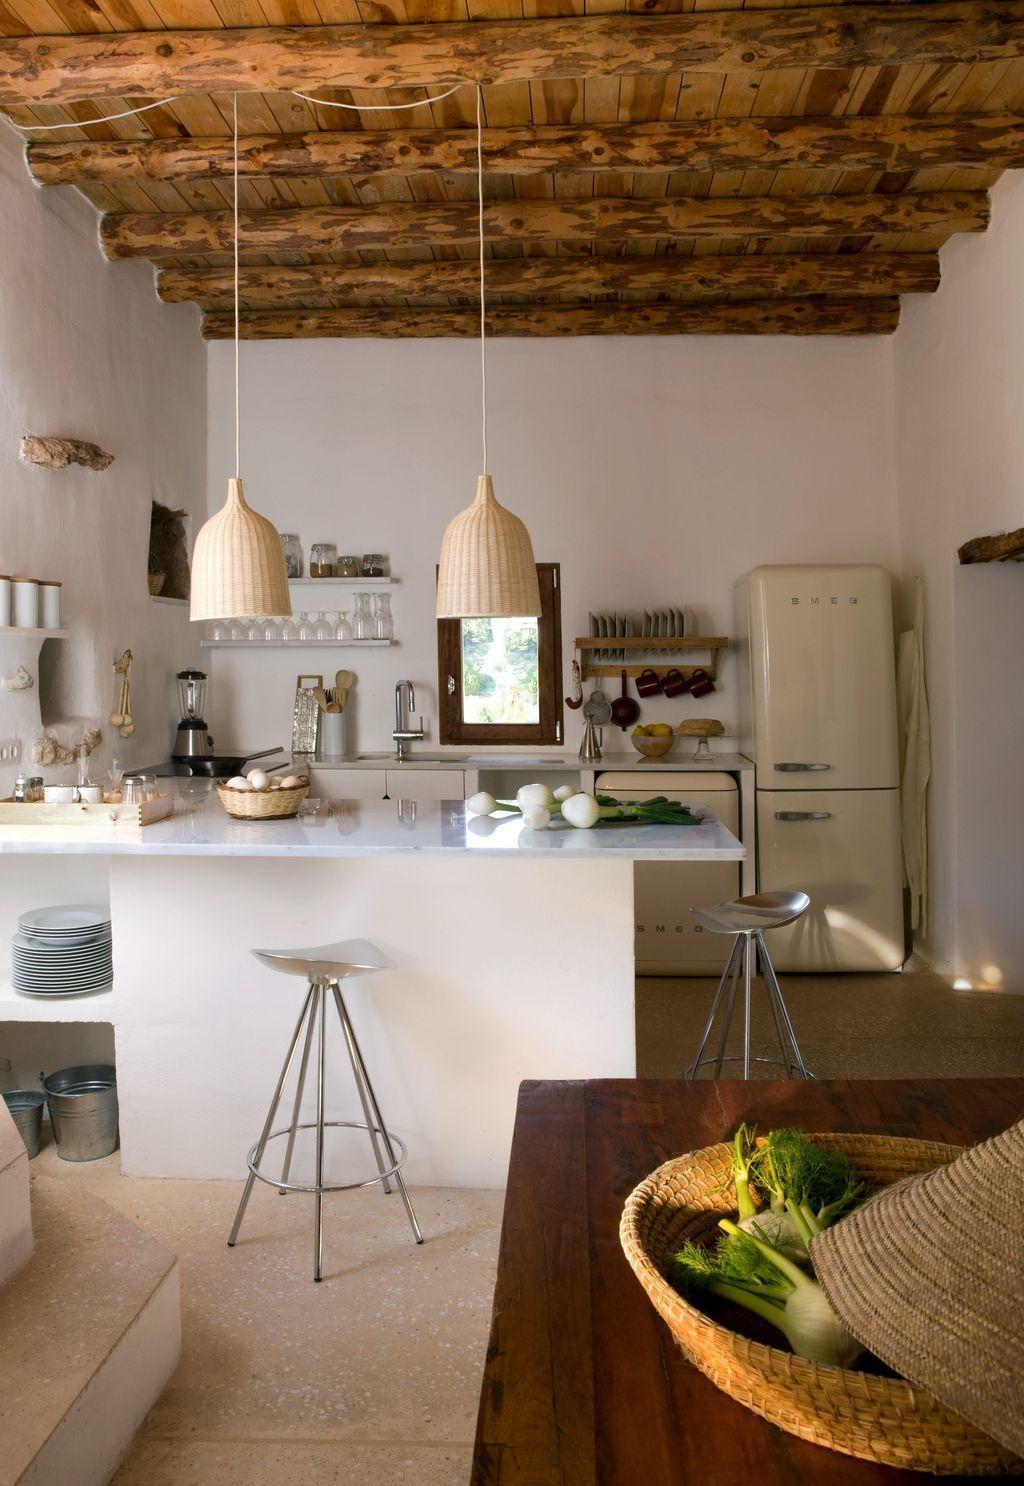 cuisine blanche esprit campagne kitchen pinterest cuisine blanche esprit et campagne. Black Bedroom Furniture Sets. Home Design Ideas